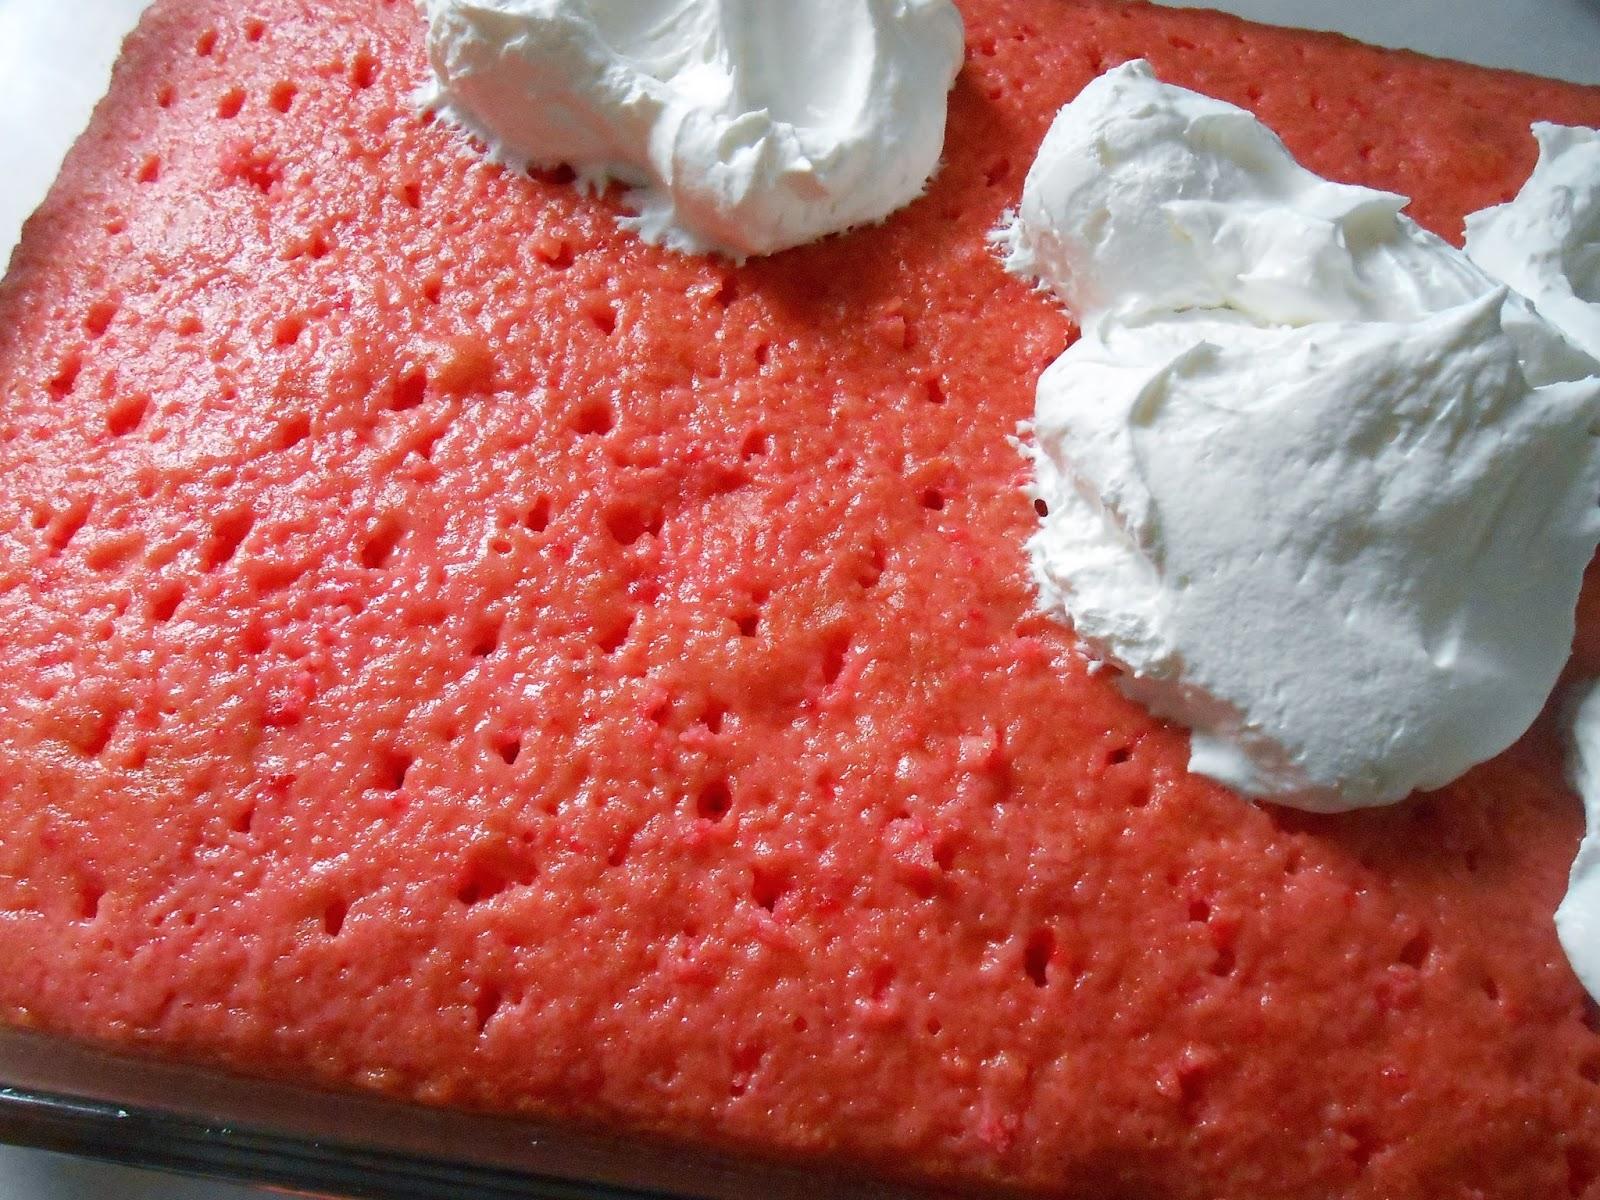 Cake Recipe Cake Jello: The Better Baker: Simple Jello Poke Cake